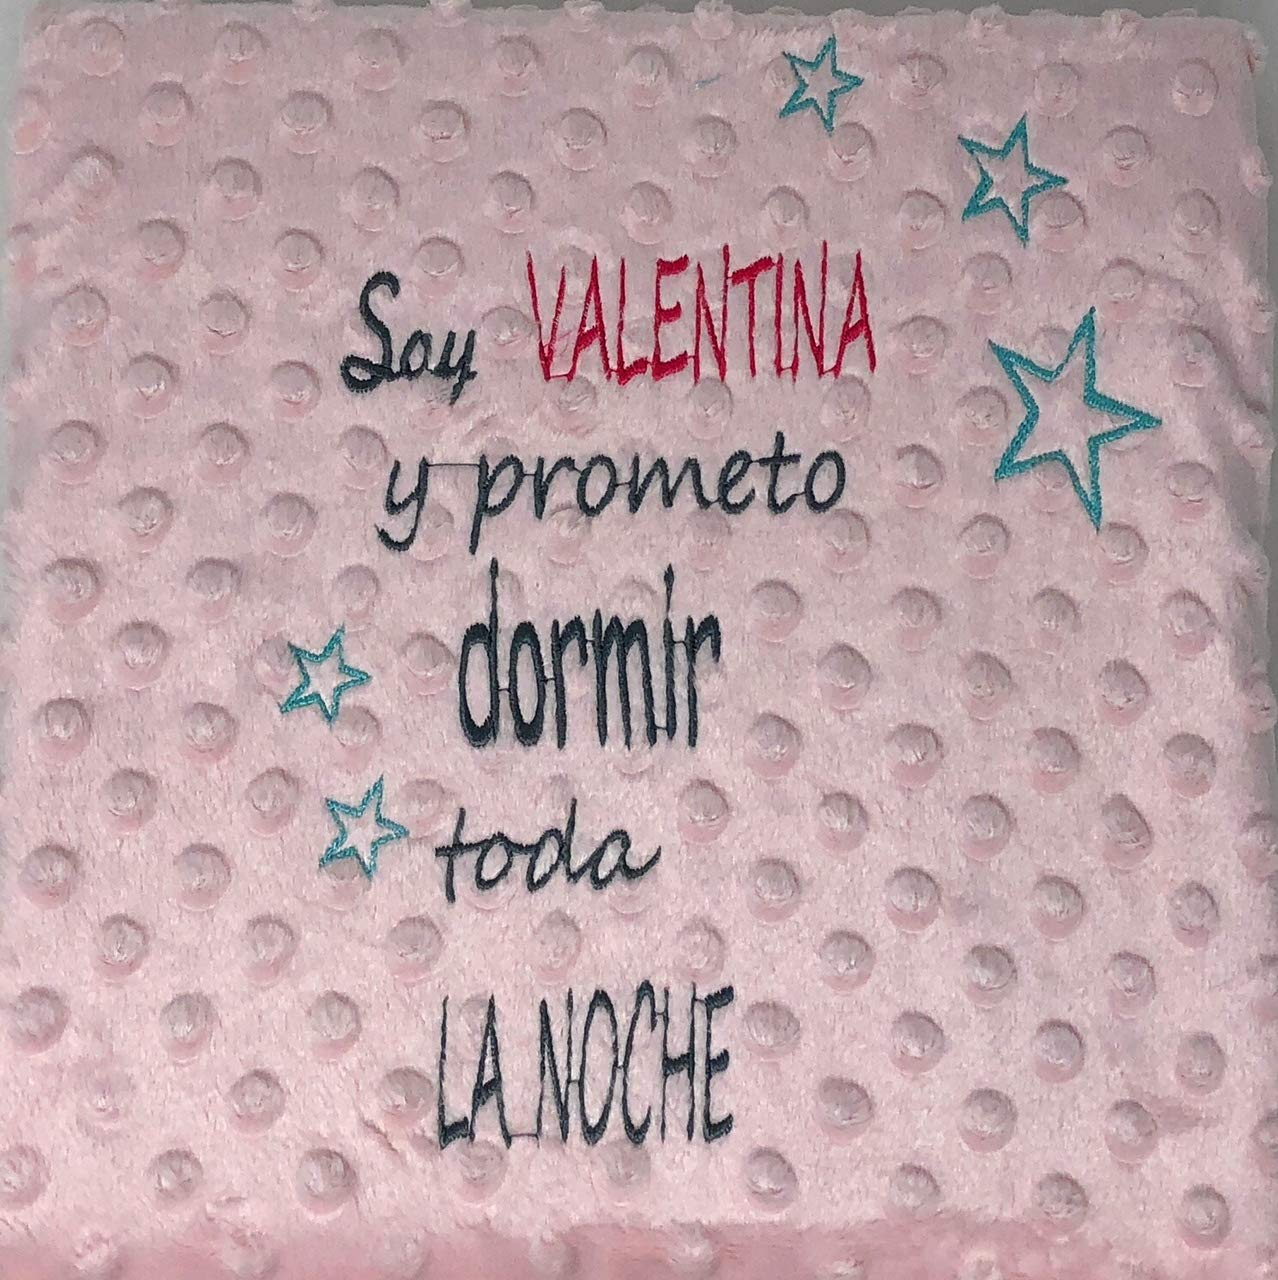 Danielstore- Manta Bordada Personalizada, Carrito Bebe-Capazo (1,10 x 0,80 cm) (rosa)